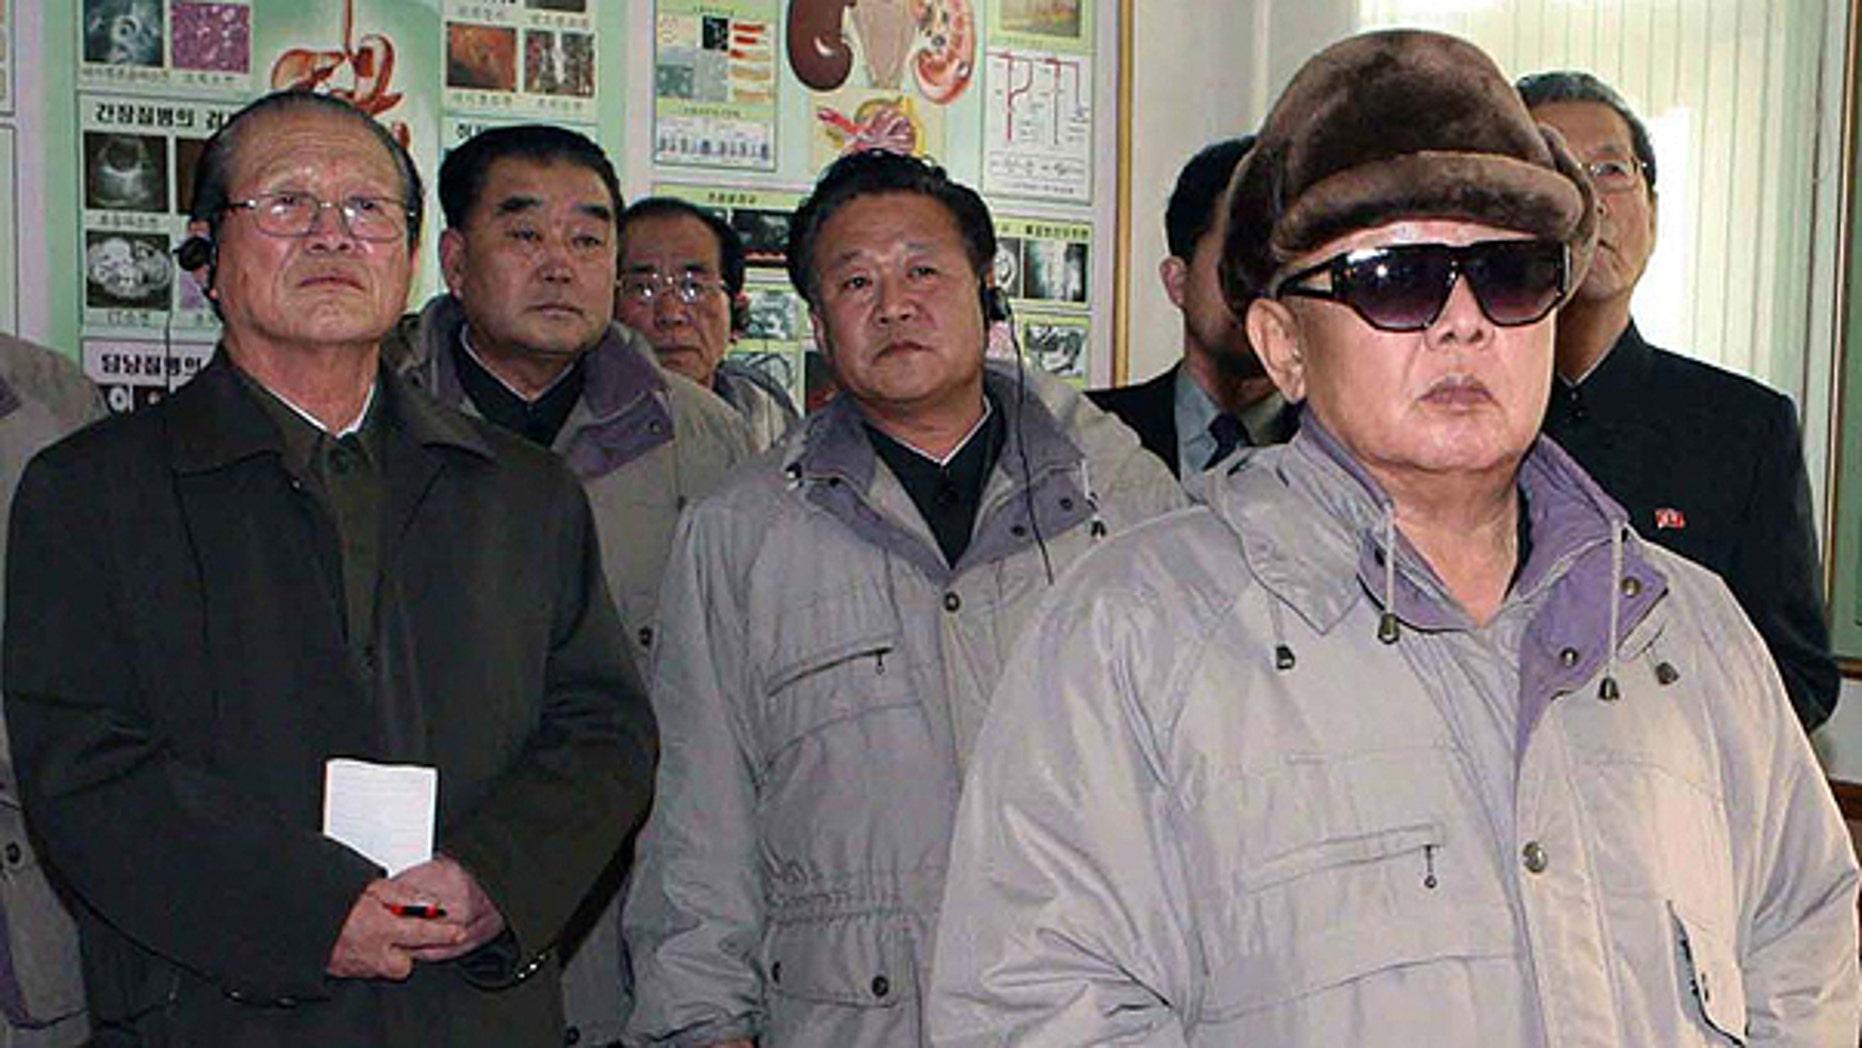 Nov. 24: In this undated photo by Korean Central News Agency via Korea News Service, North Korean leader Kim Jong Il visits a medical school in Pyongyang, North Korea.